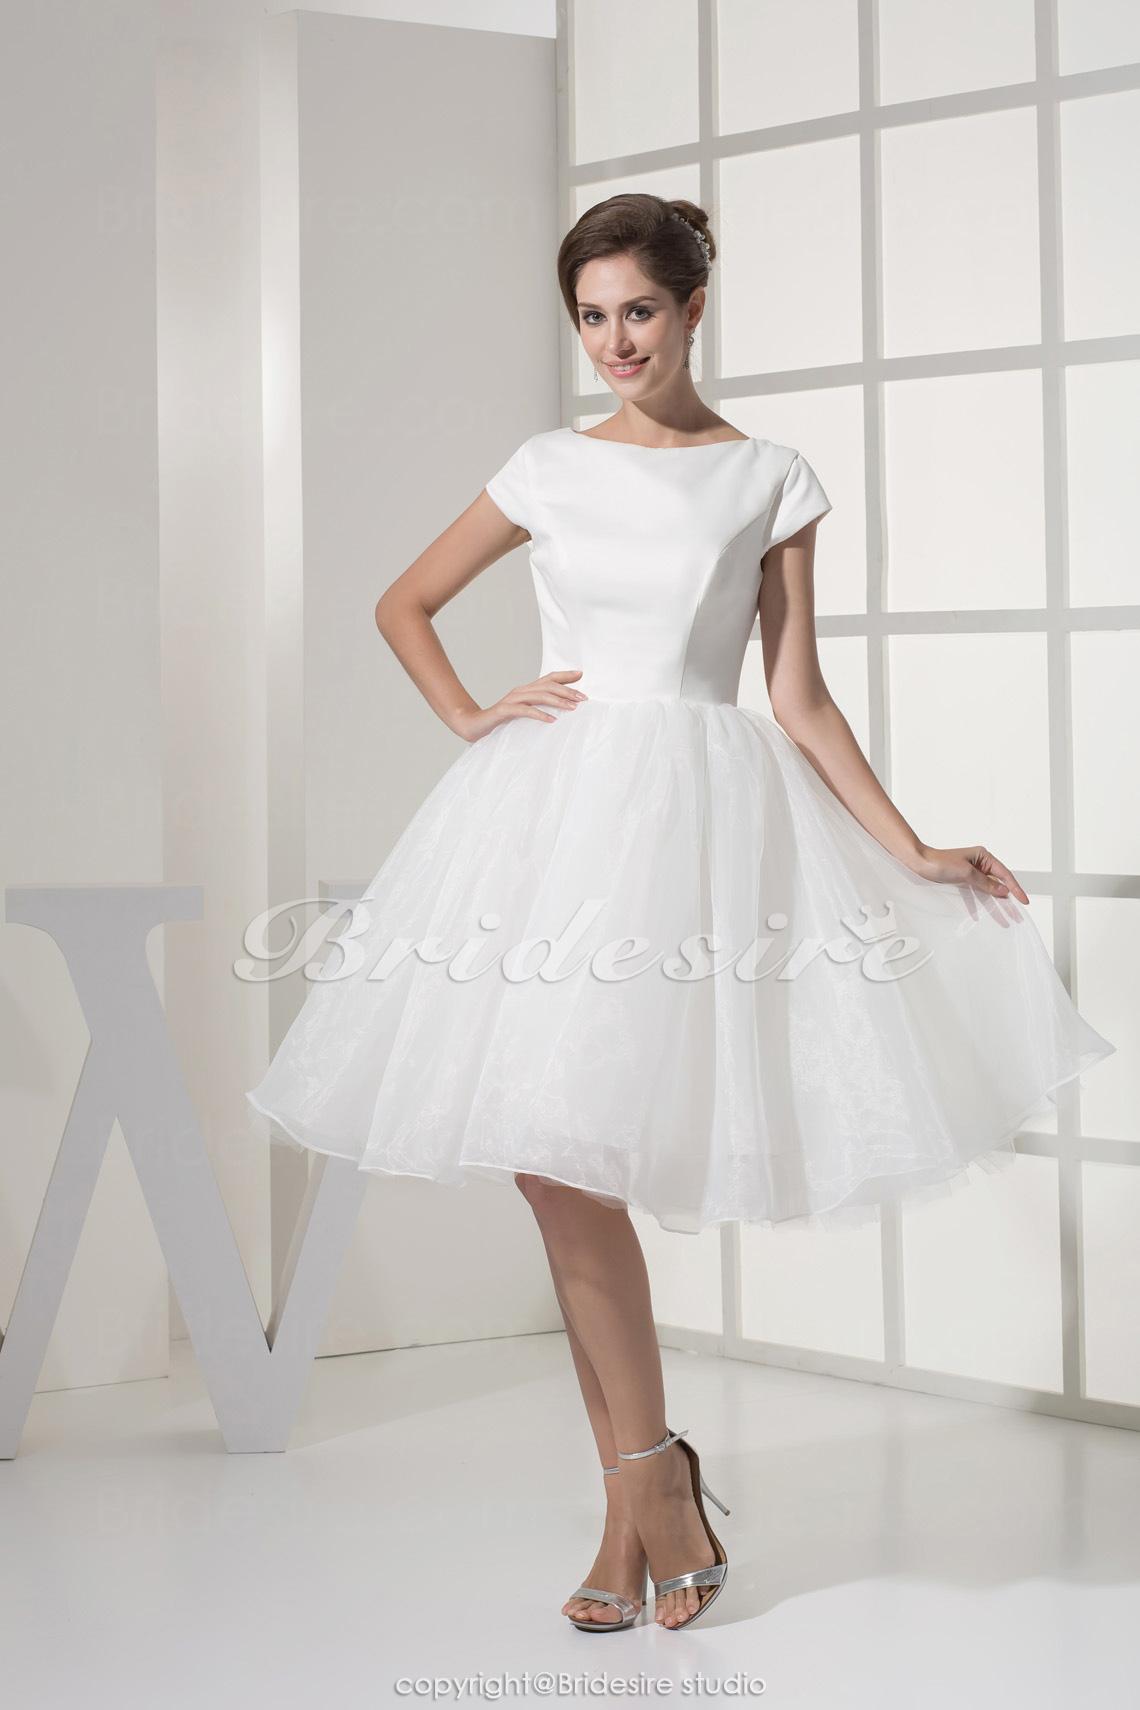 726724eb8 Bridesire - Corte Princesa Escote A la Base Hasta la Rodilla Manga Corta  Organza Tafetán Vestido [BD4374] - €78.91 : Bridesire